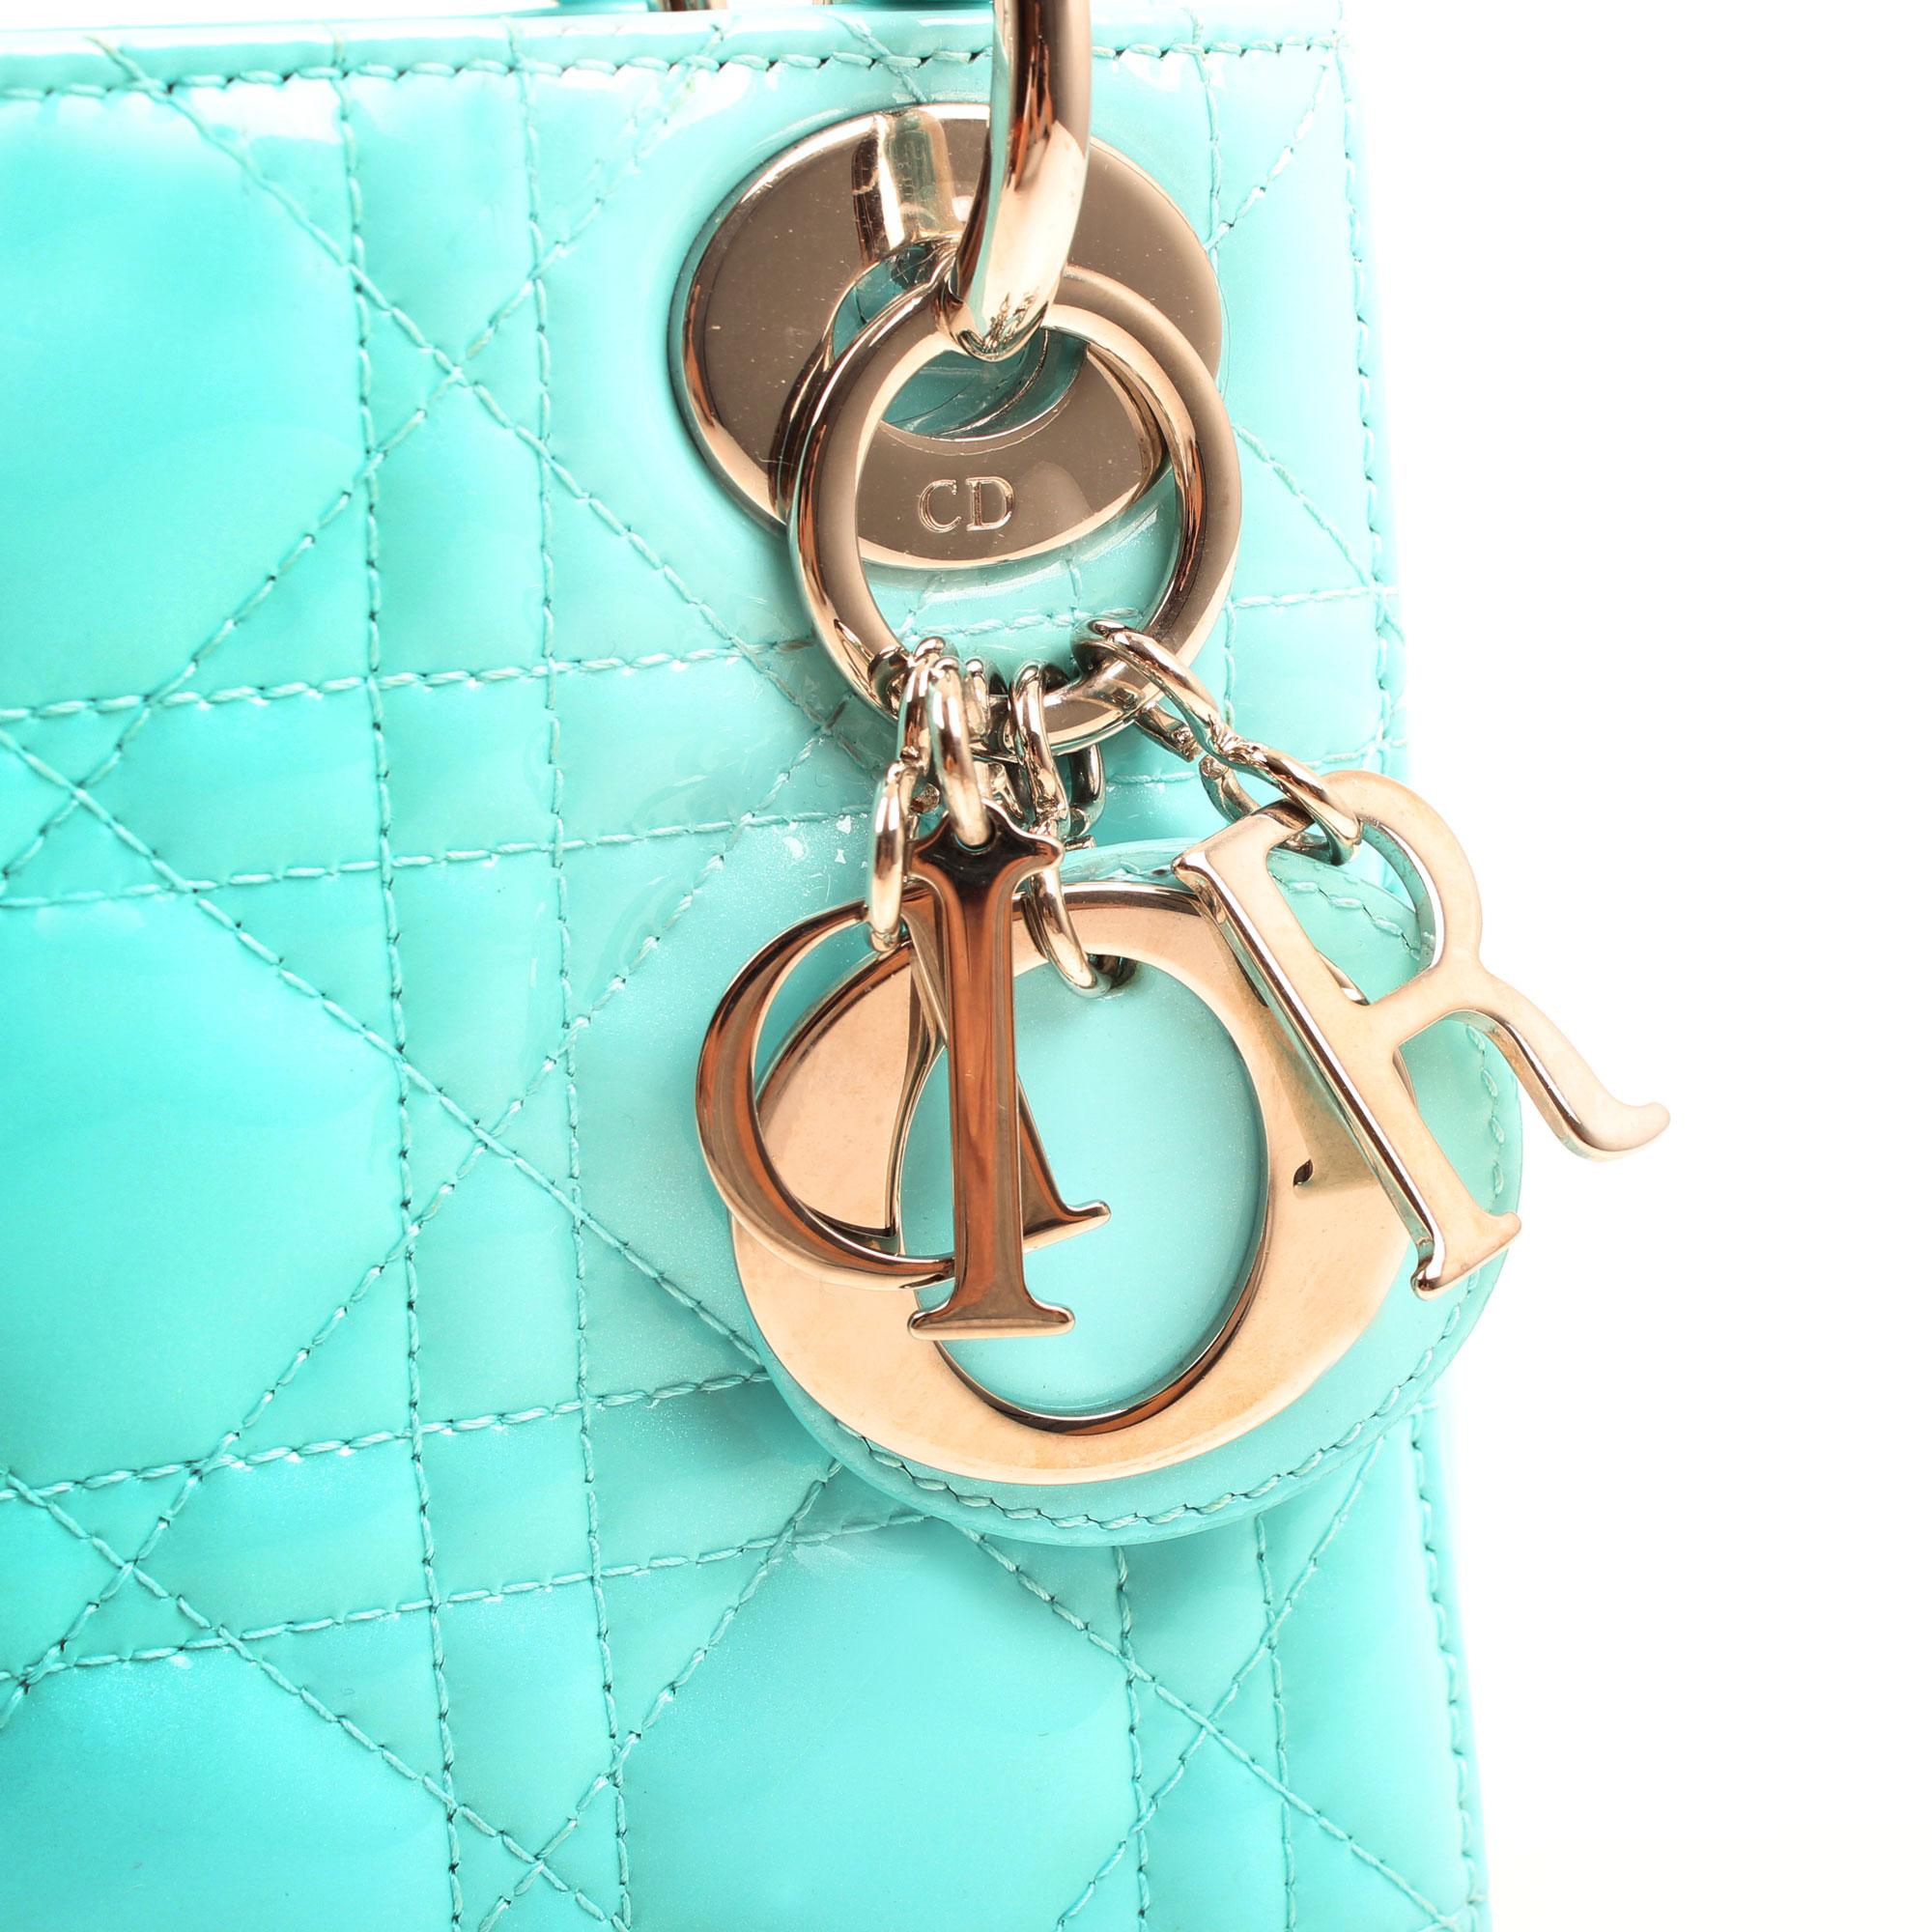 Imagen del herraje del bolso dior mini lady dior azul piel acharolada detalle